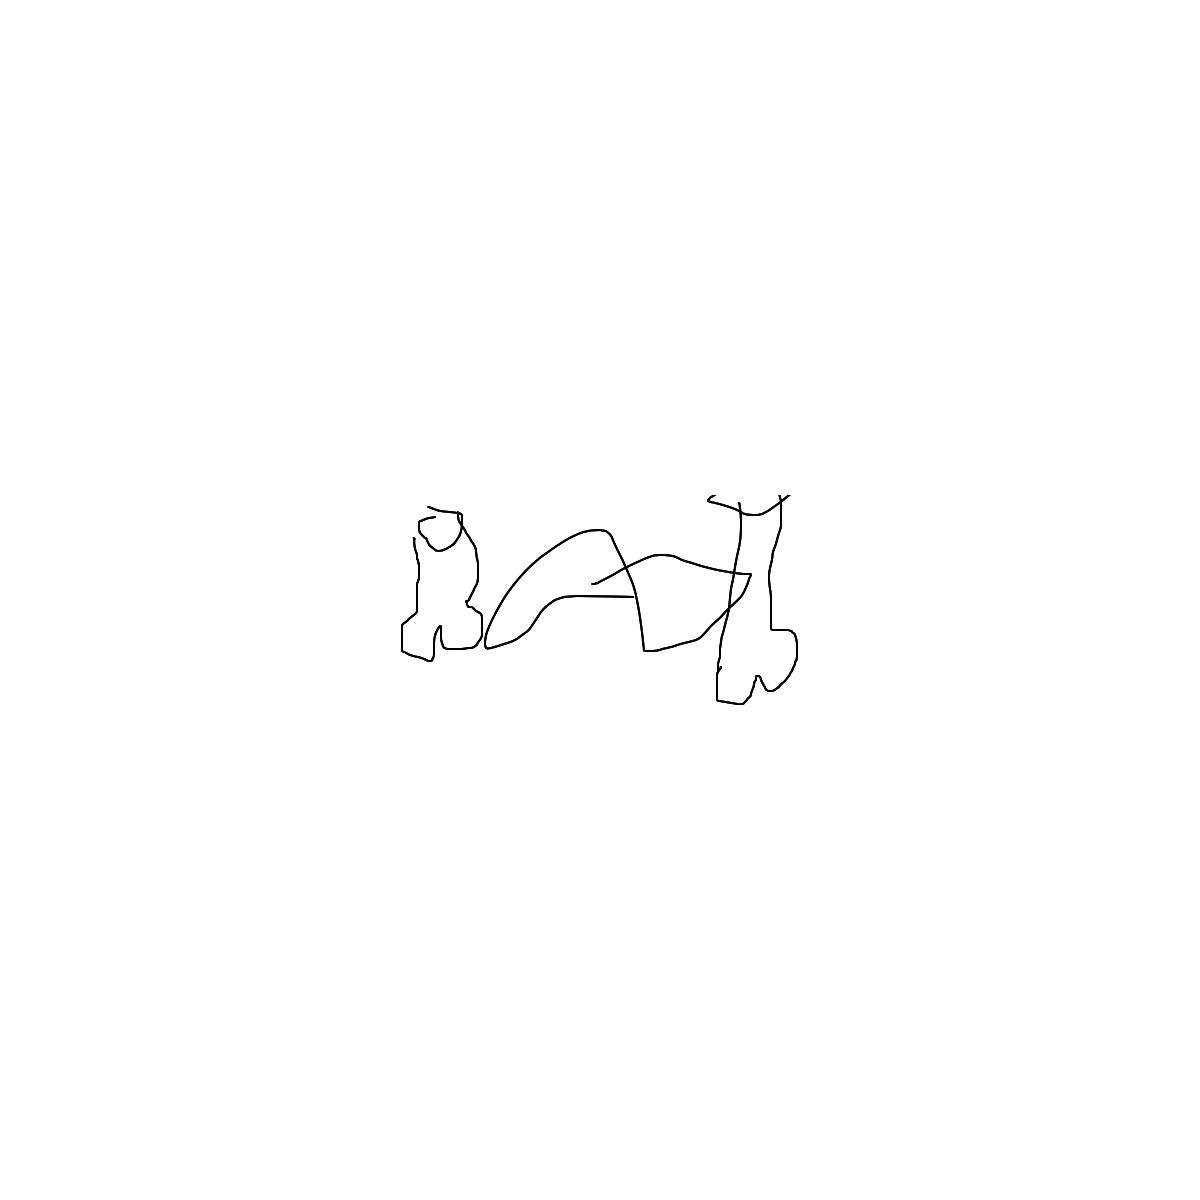 BAAAM drawing#92 lat:39.6754837036132800lng: -81.7945861816406200